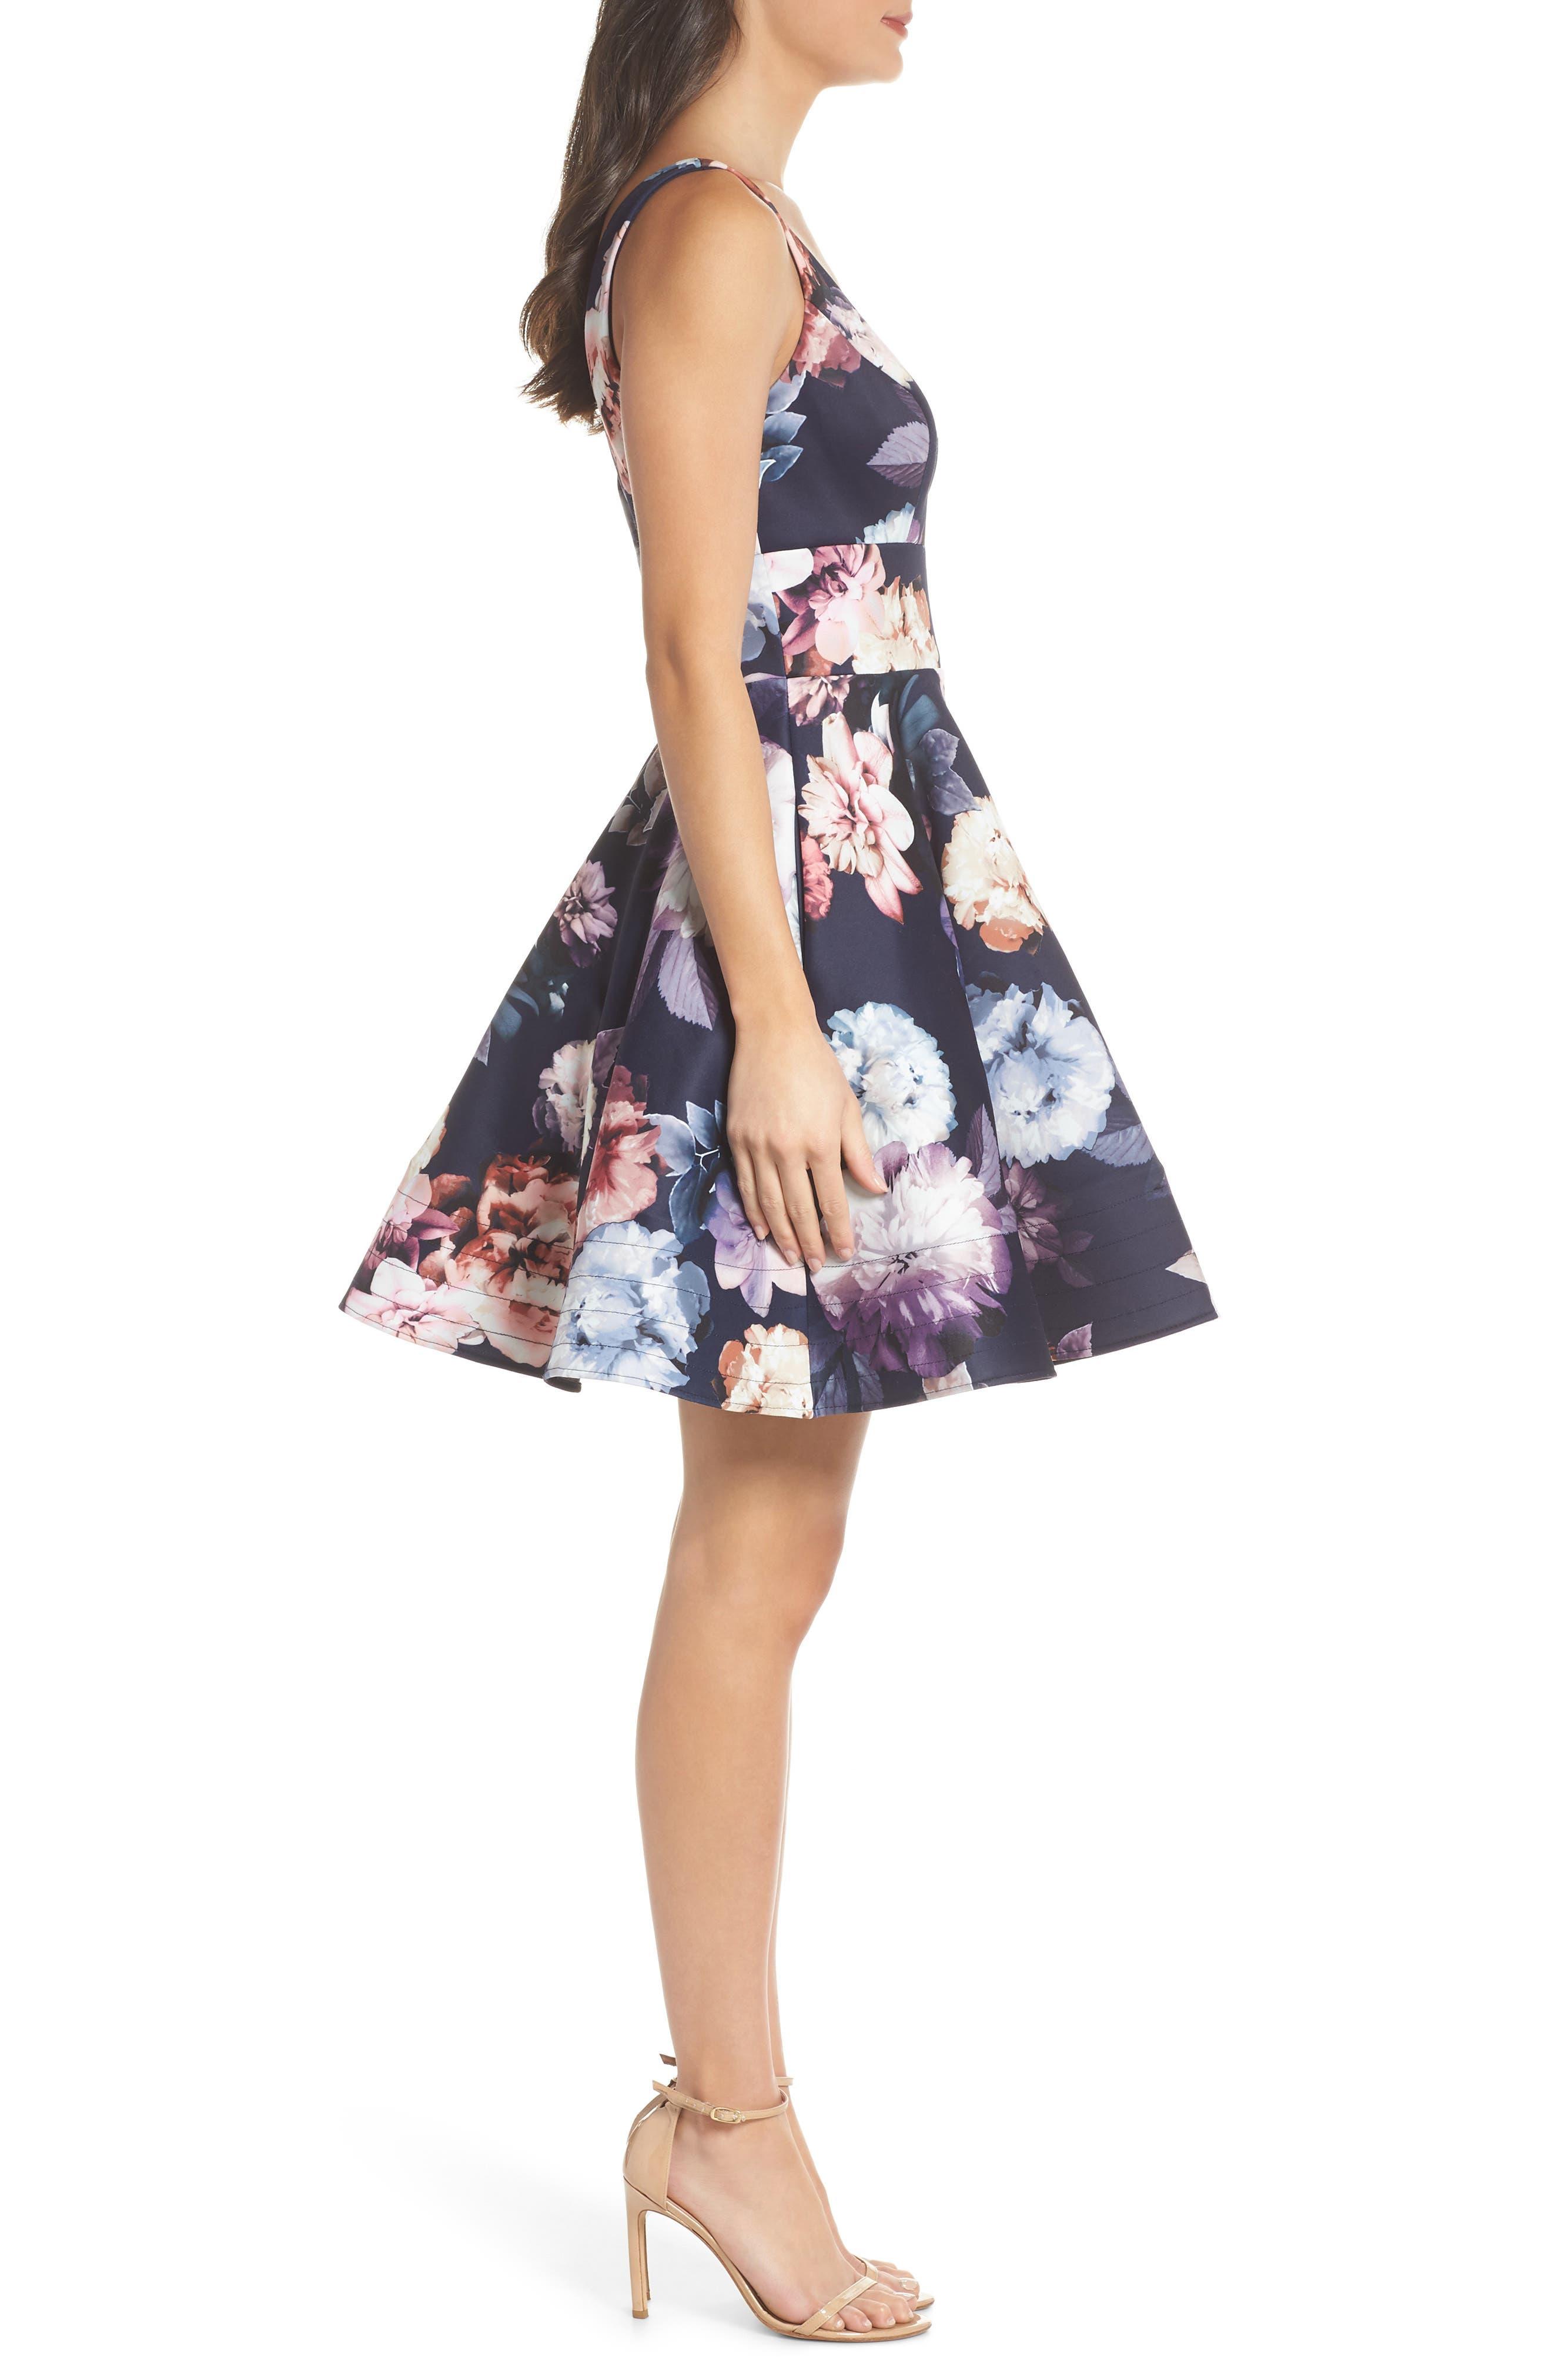 Floral Print Fit & Flare Dress,                             Alternate thumbnail 3, color,                             NAVY/ PURPLE